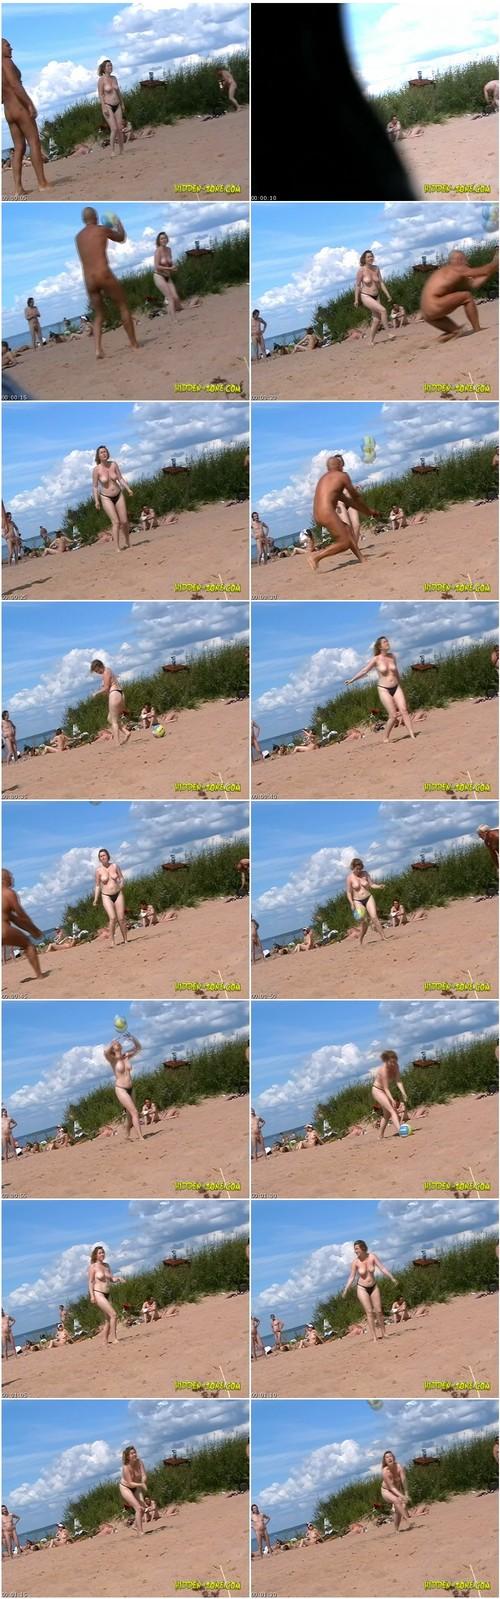 Nudity131_thumb_m.jpg